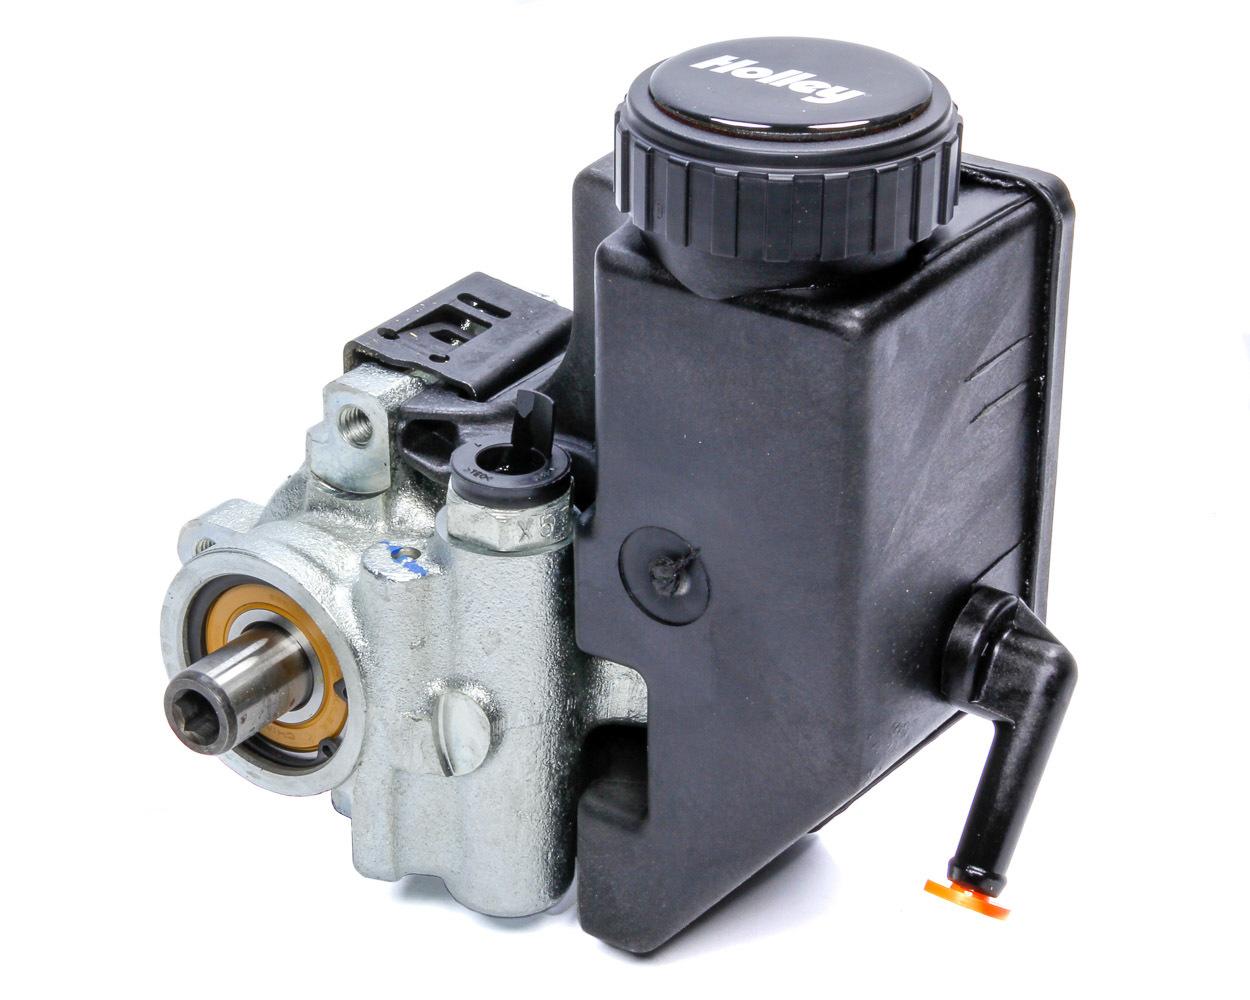 Holley 198-101 Power Steering Pump, GM Type 2, Standard Volume, Integral Reservoir, Iron, Natural, GM LS-Series, Each